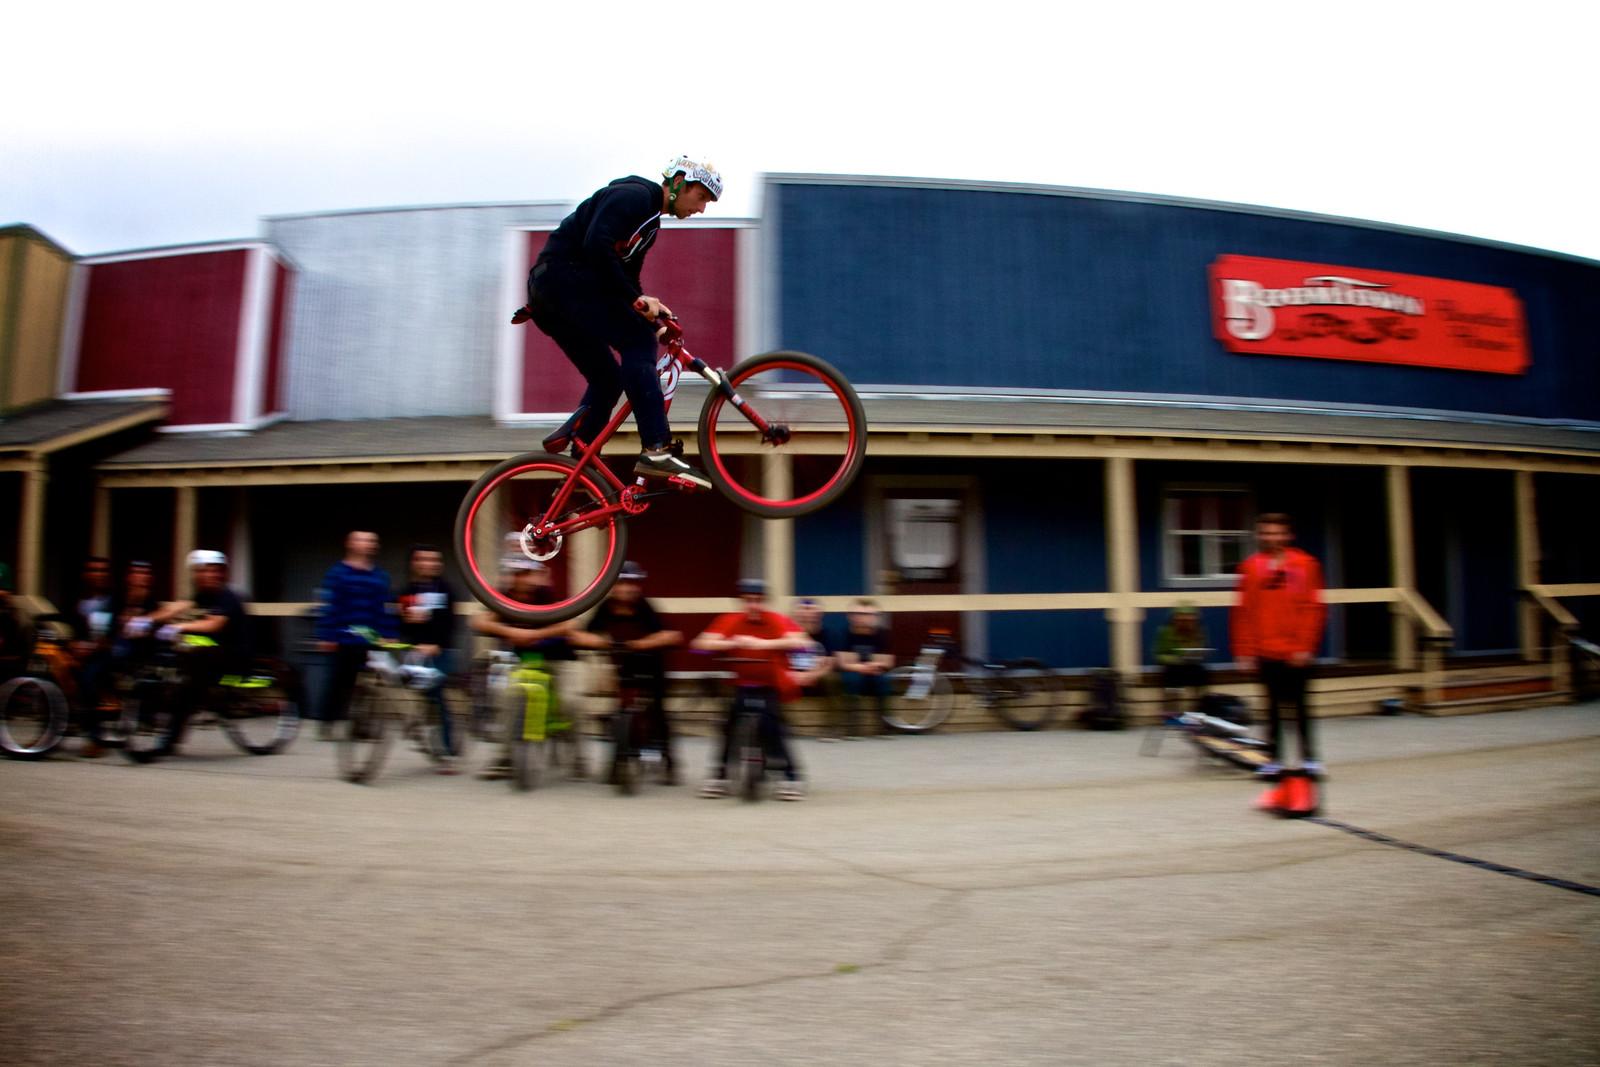 Jake Kinney, Tied with Logan Binggeli for the Long Jump Win - corytepper.com - Mountain Biking Pictures - Vital MTB